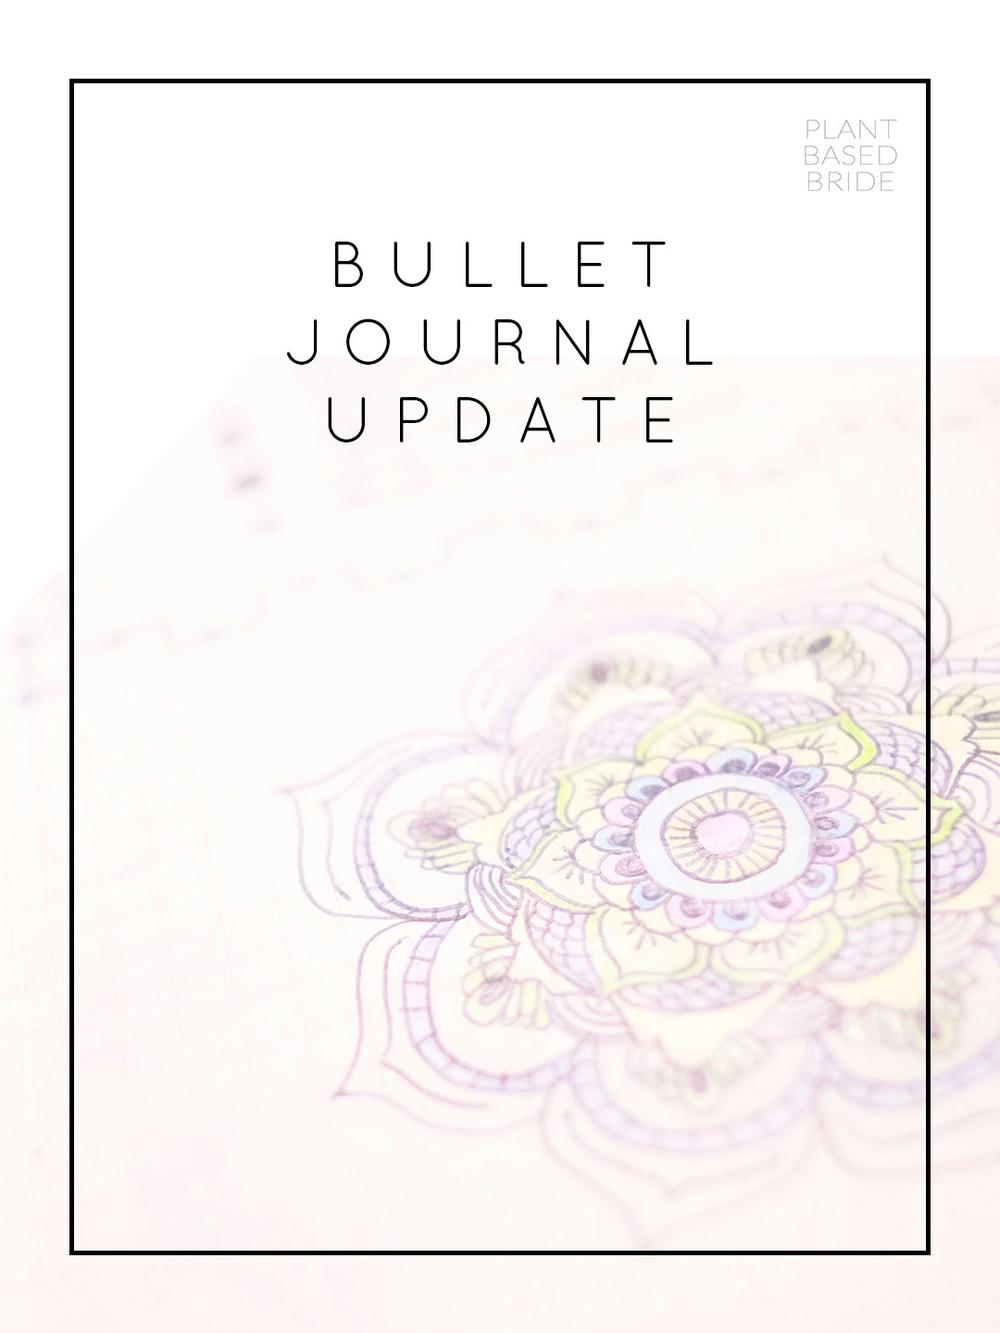 Bullet Journal Update + Tour! // Plant Based Bride // Bujo